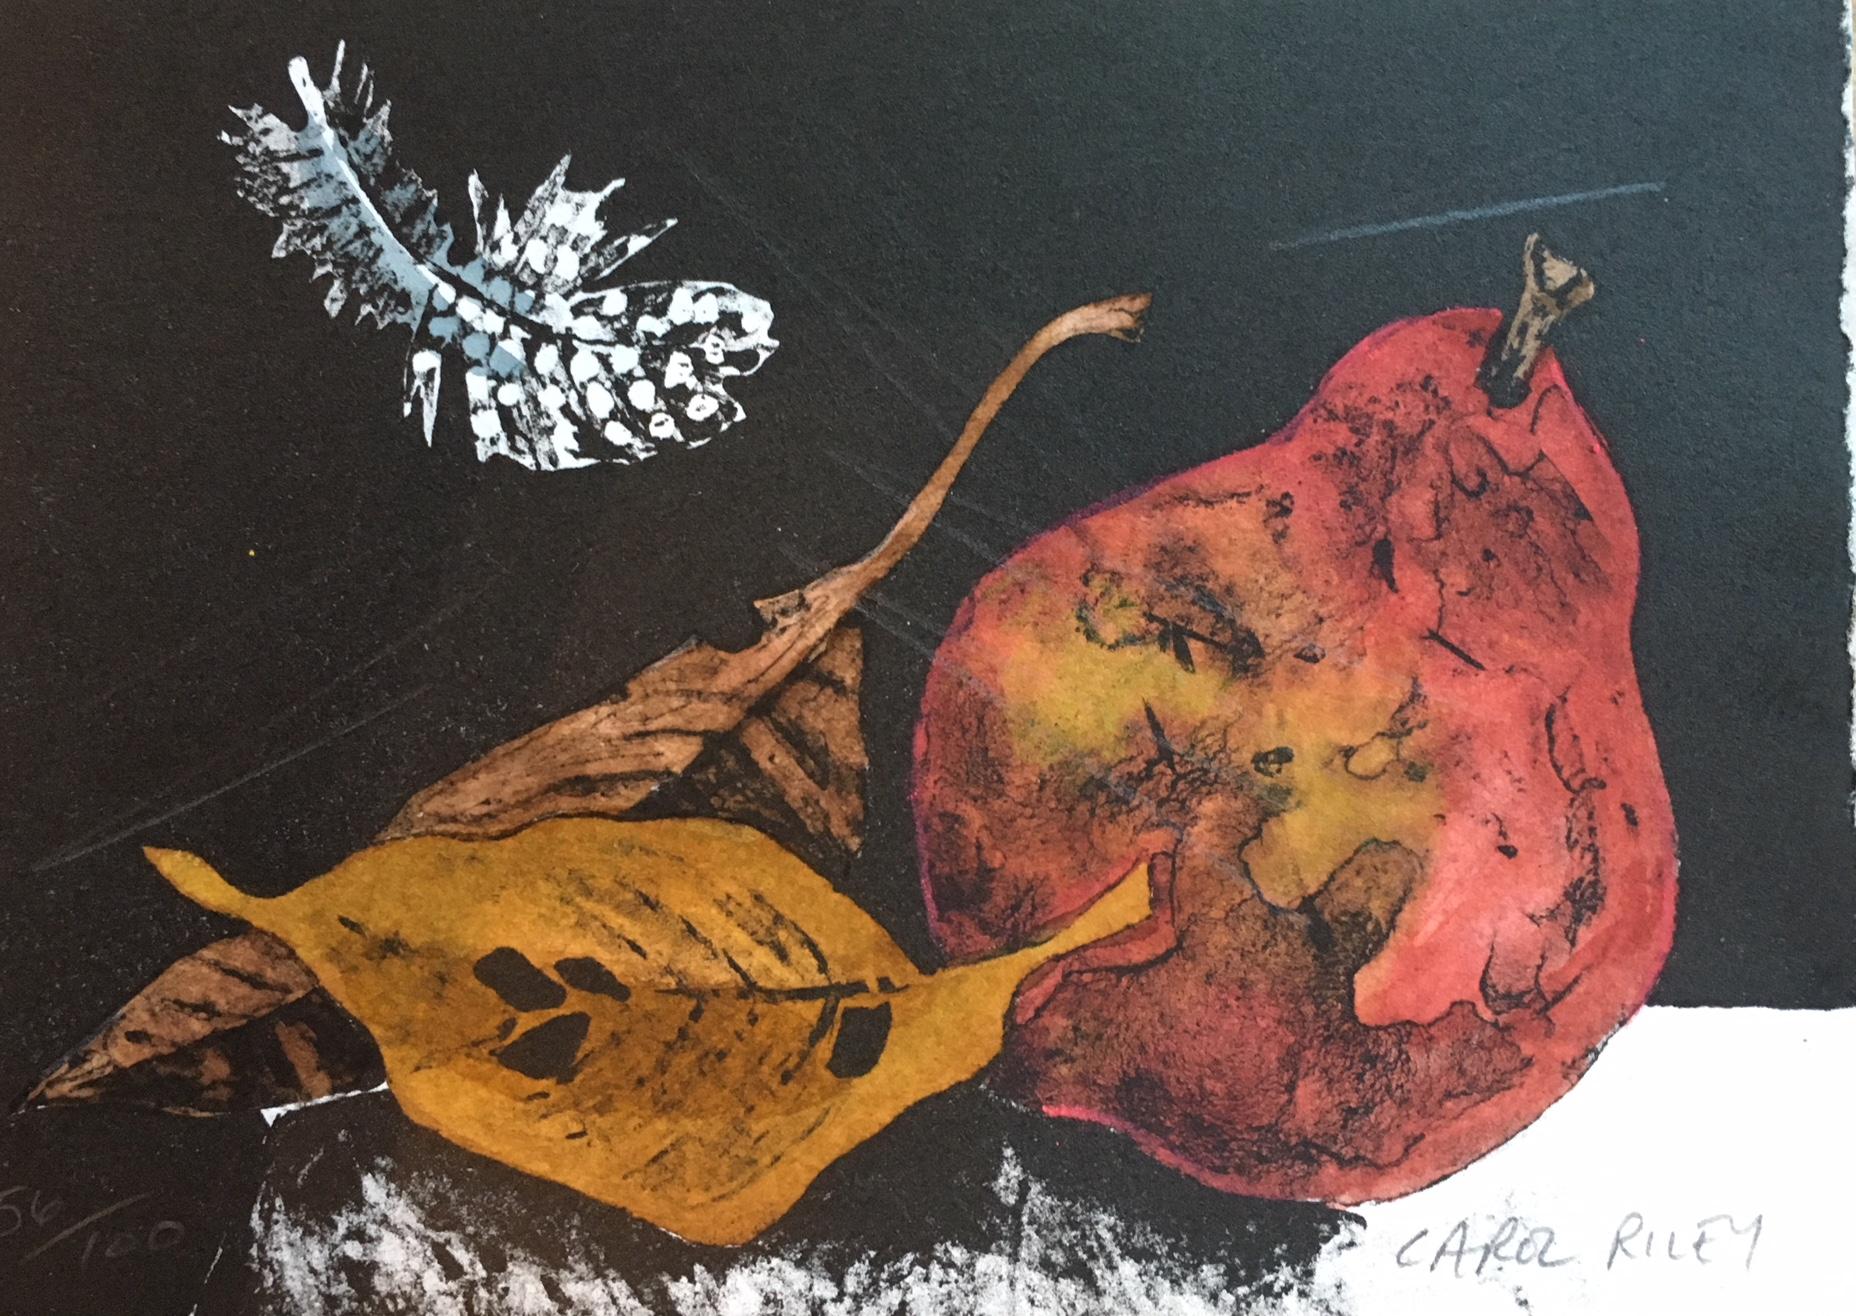 Carol Riley, Featherfall, lithograph & watercolor